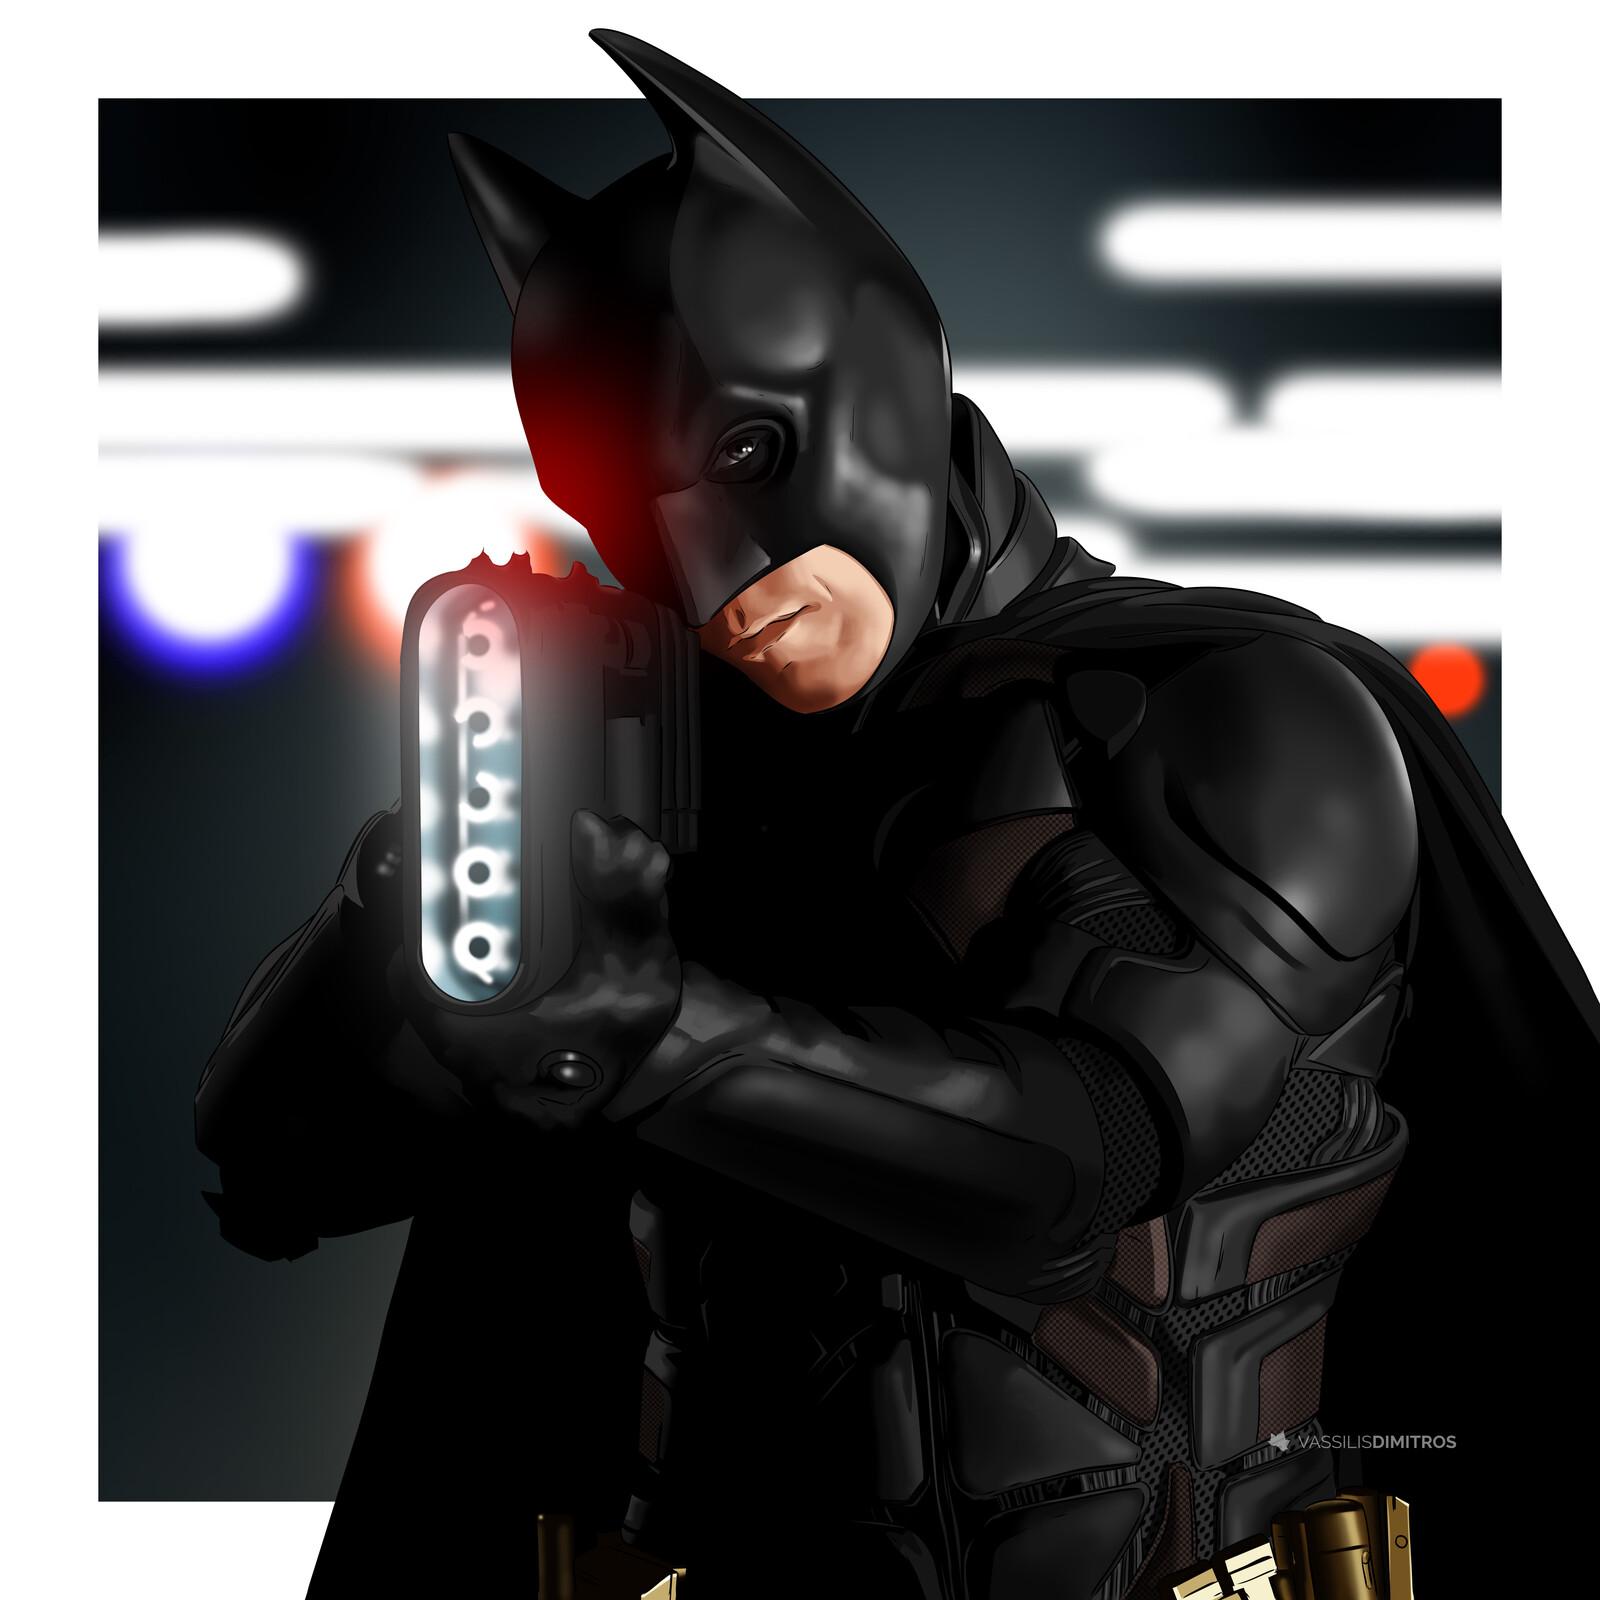 Christian Bale Batman Begins (2005) The Dark Knight (2008) The Dark Knight Rises (2012)